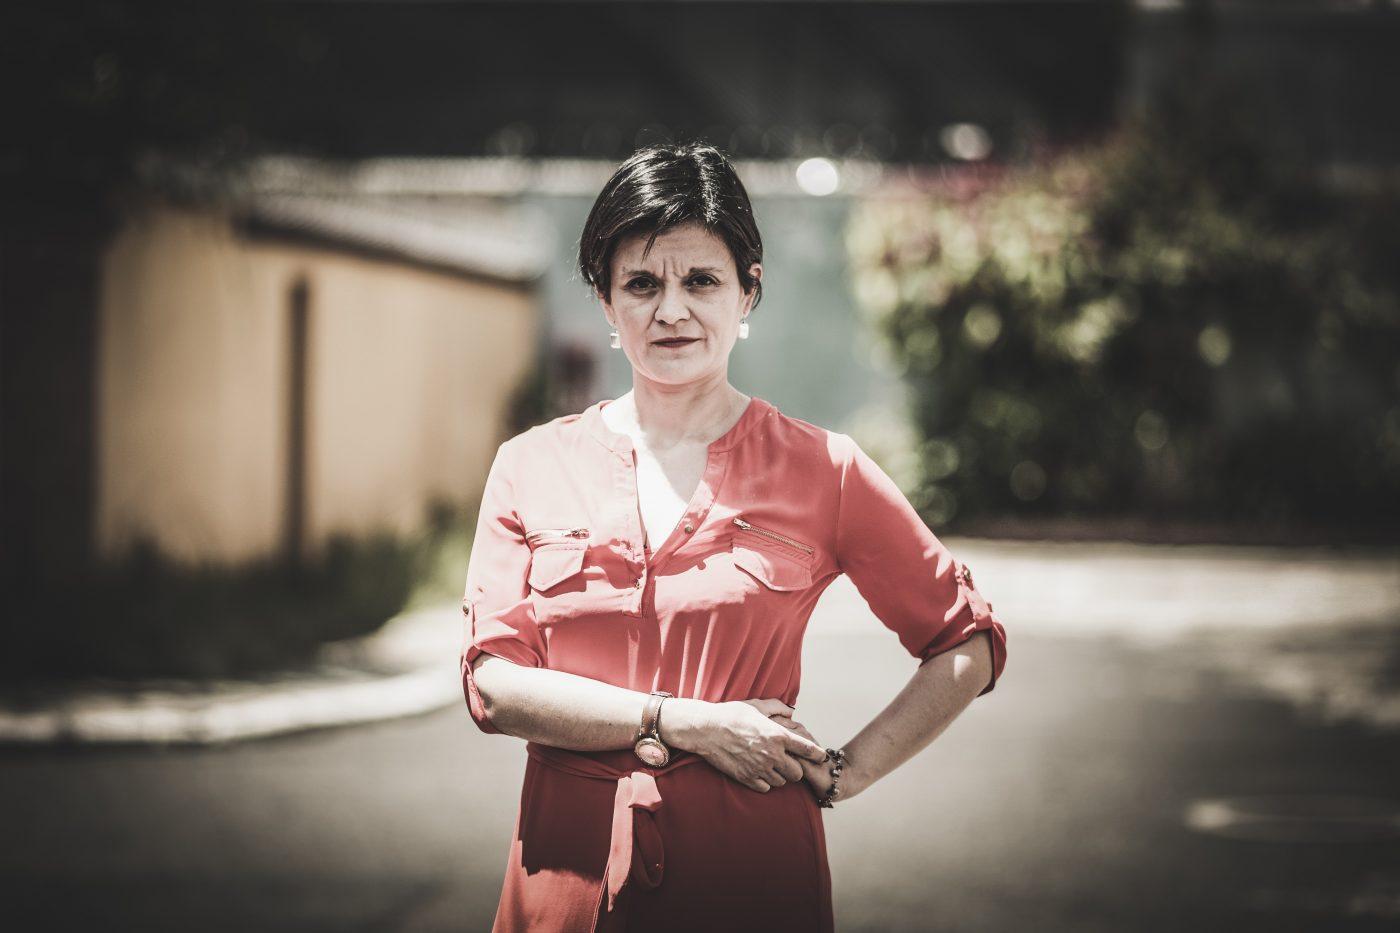 Retrato paciente de síndrome de Tourette